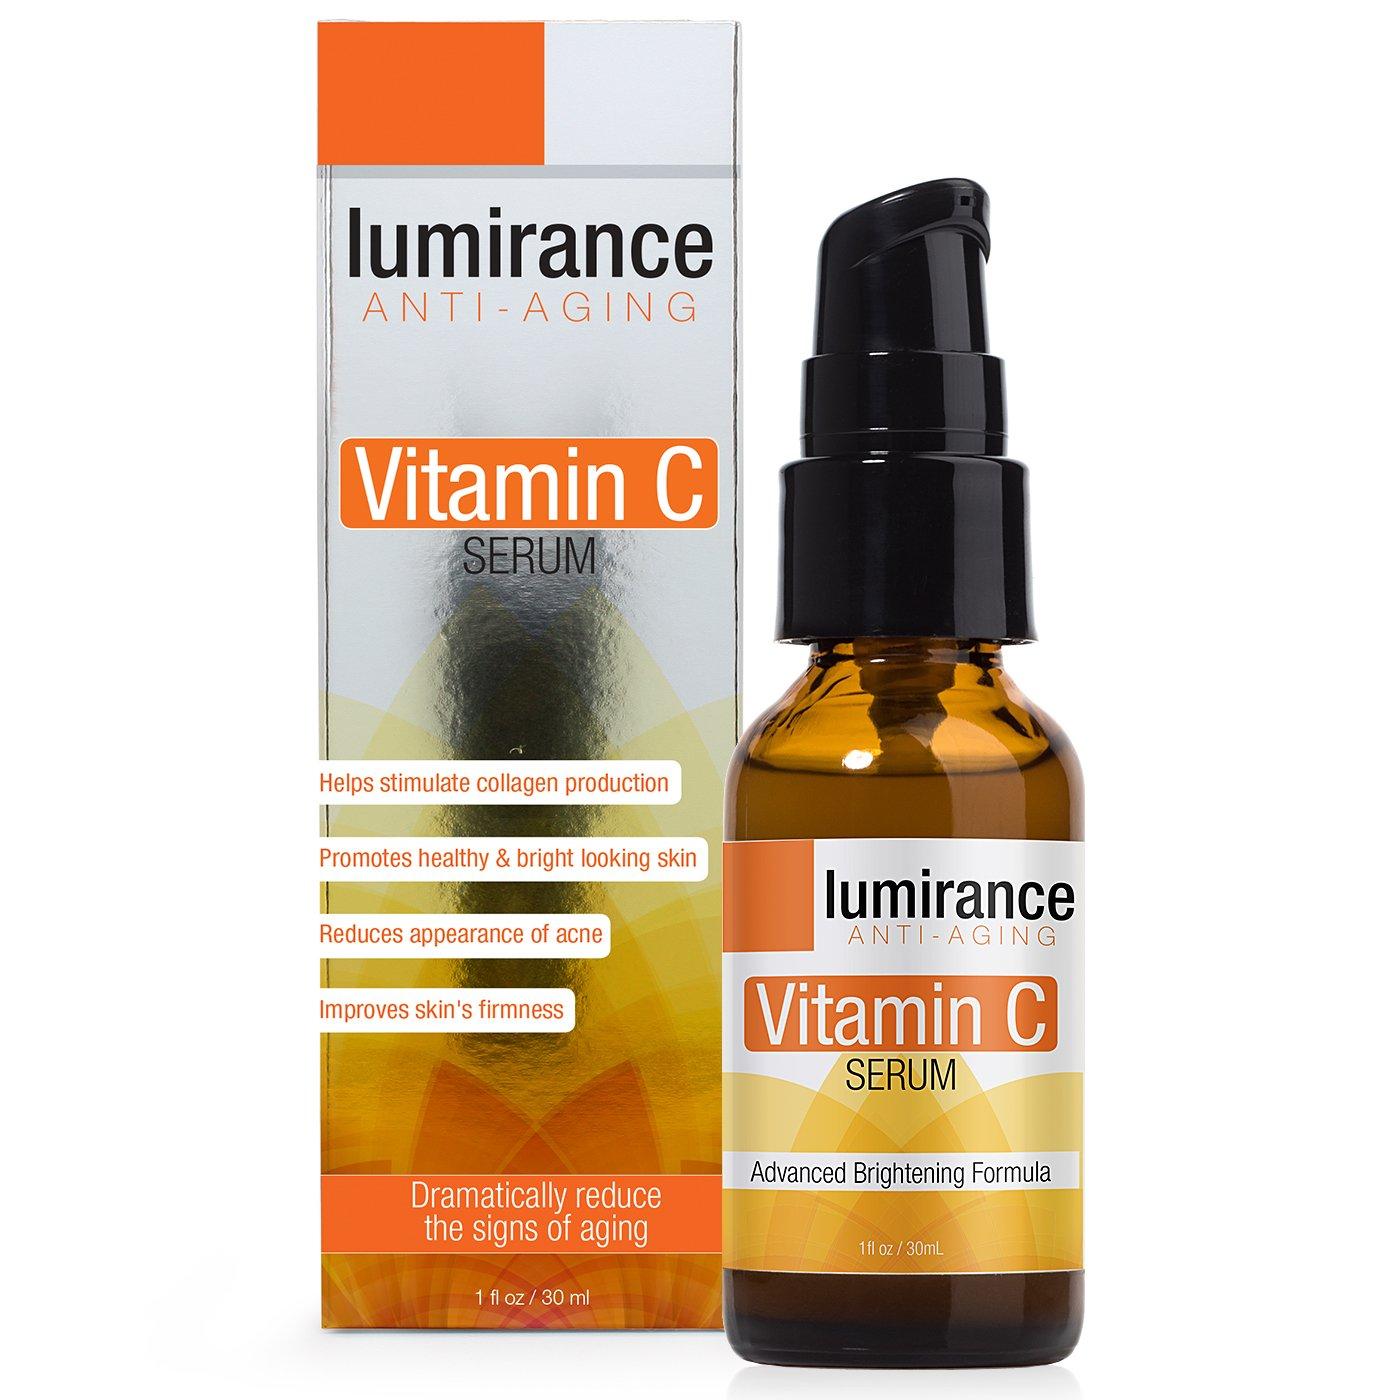 Lumirance Vitamin C Anti-Aging Serum